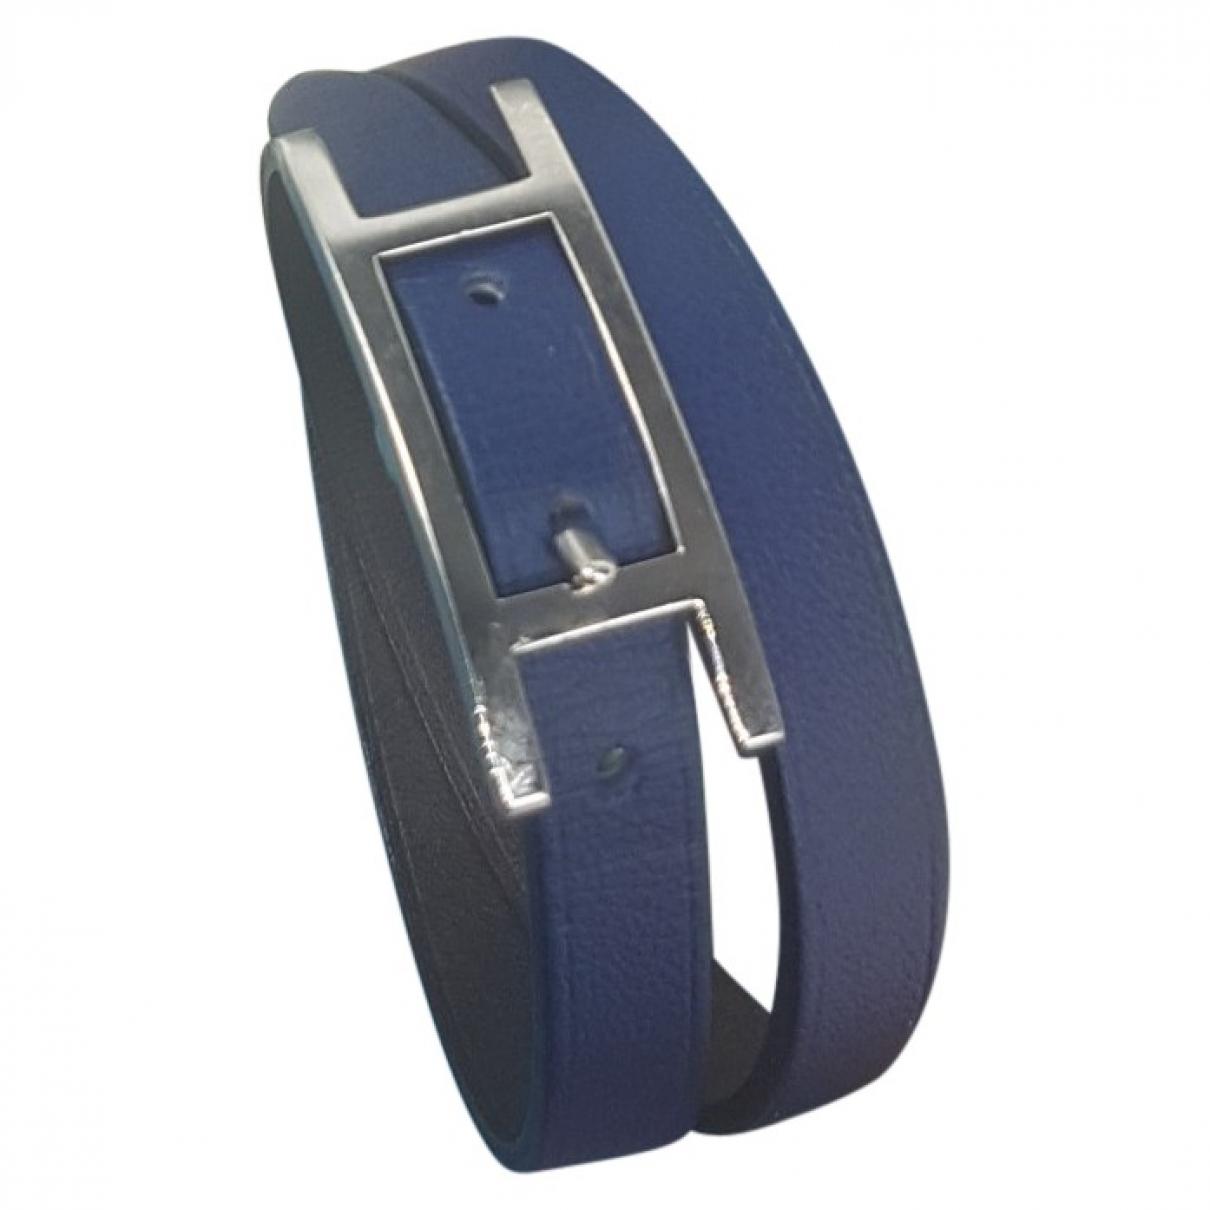 Hermes - Bracelet Hapi pour femme en cuir - marine